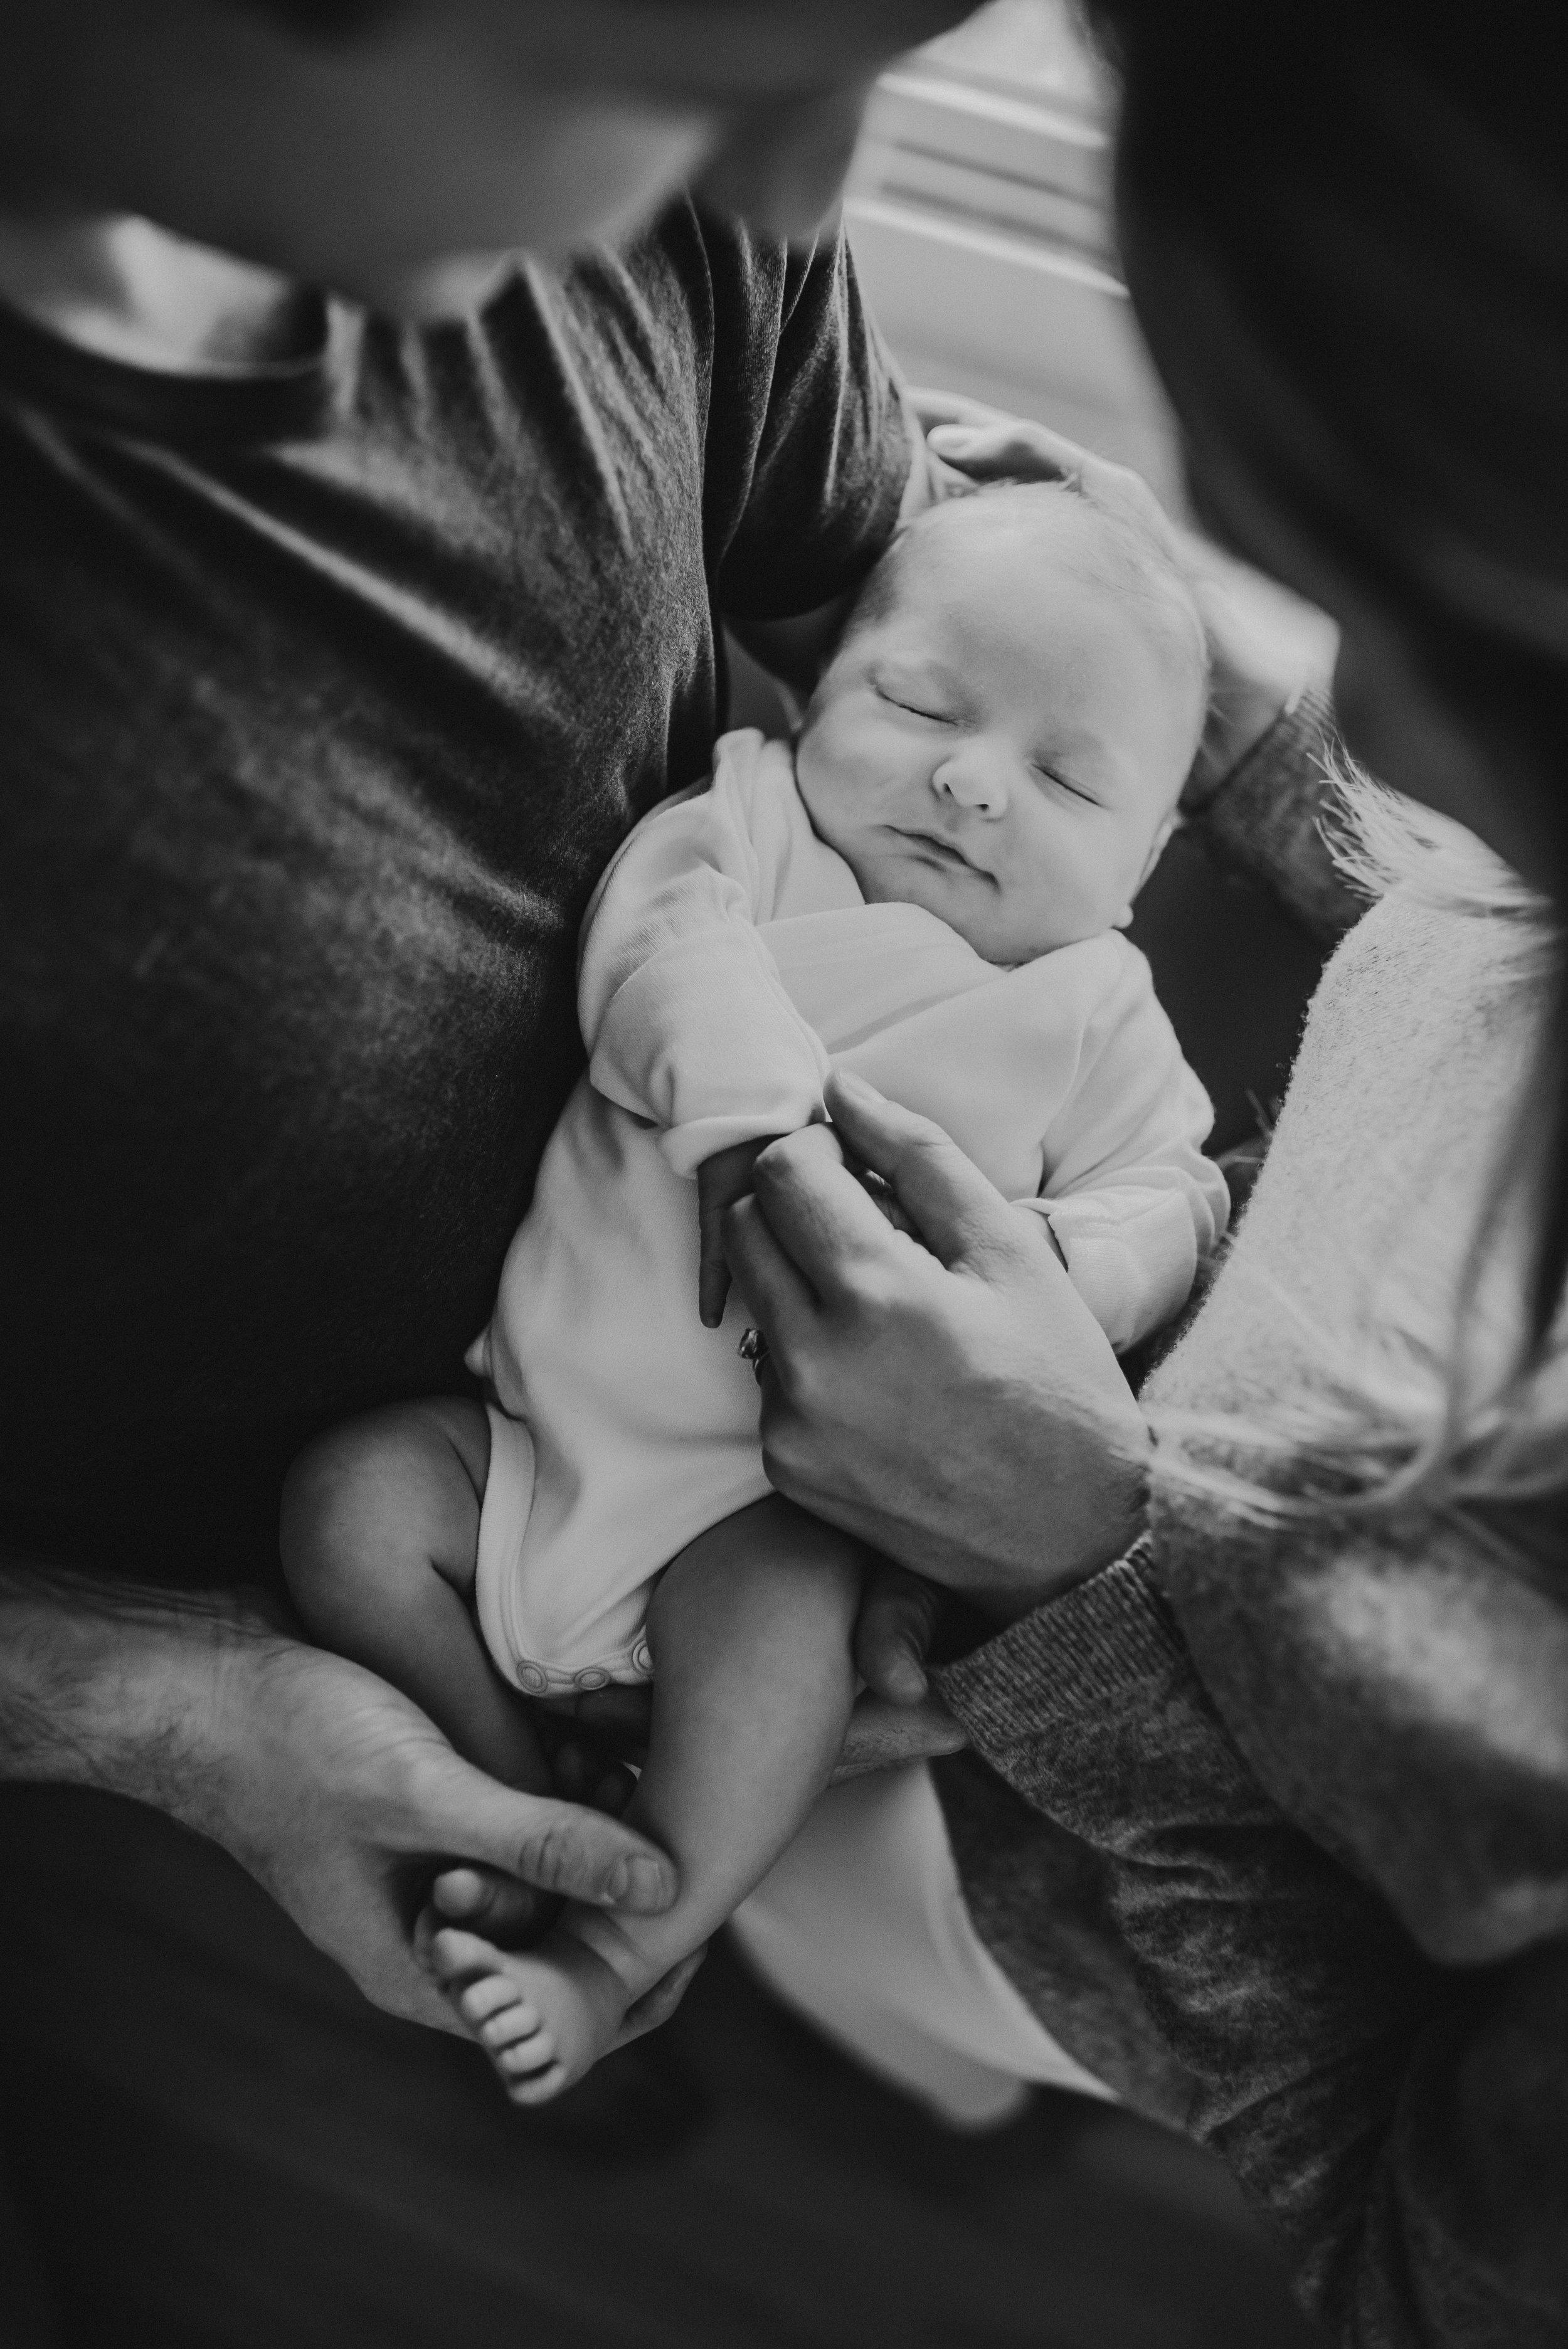 BabyKate_StoriedPhotography_2019-52.jpg